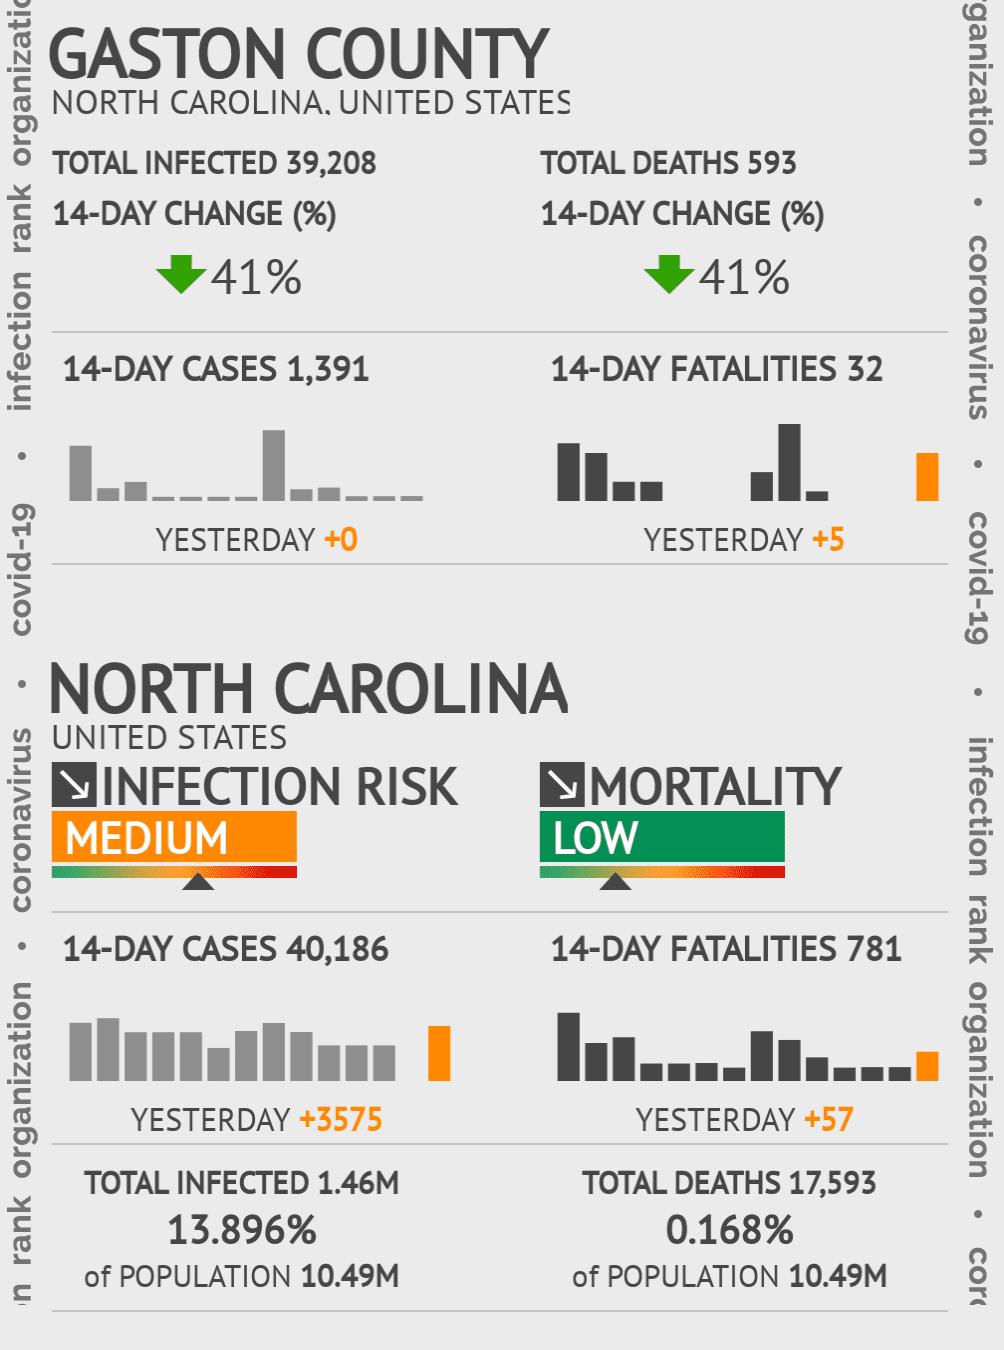 Gaston County Coronavirus Covid-19 Risk of Infection on February 26, 2021